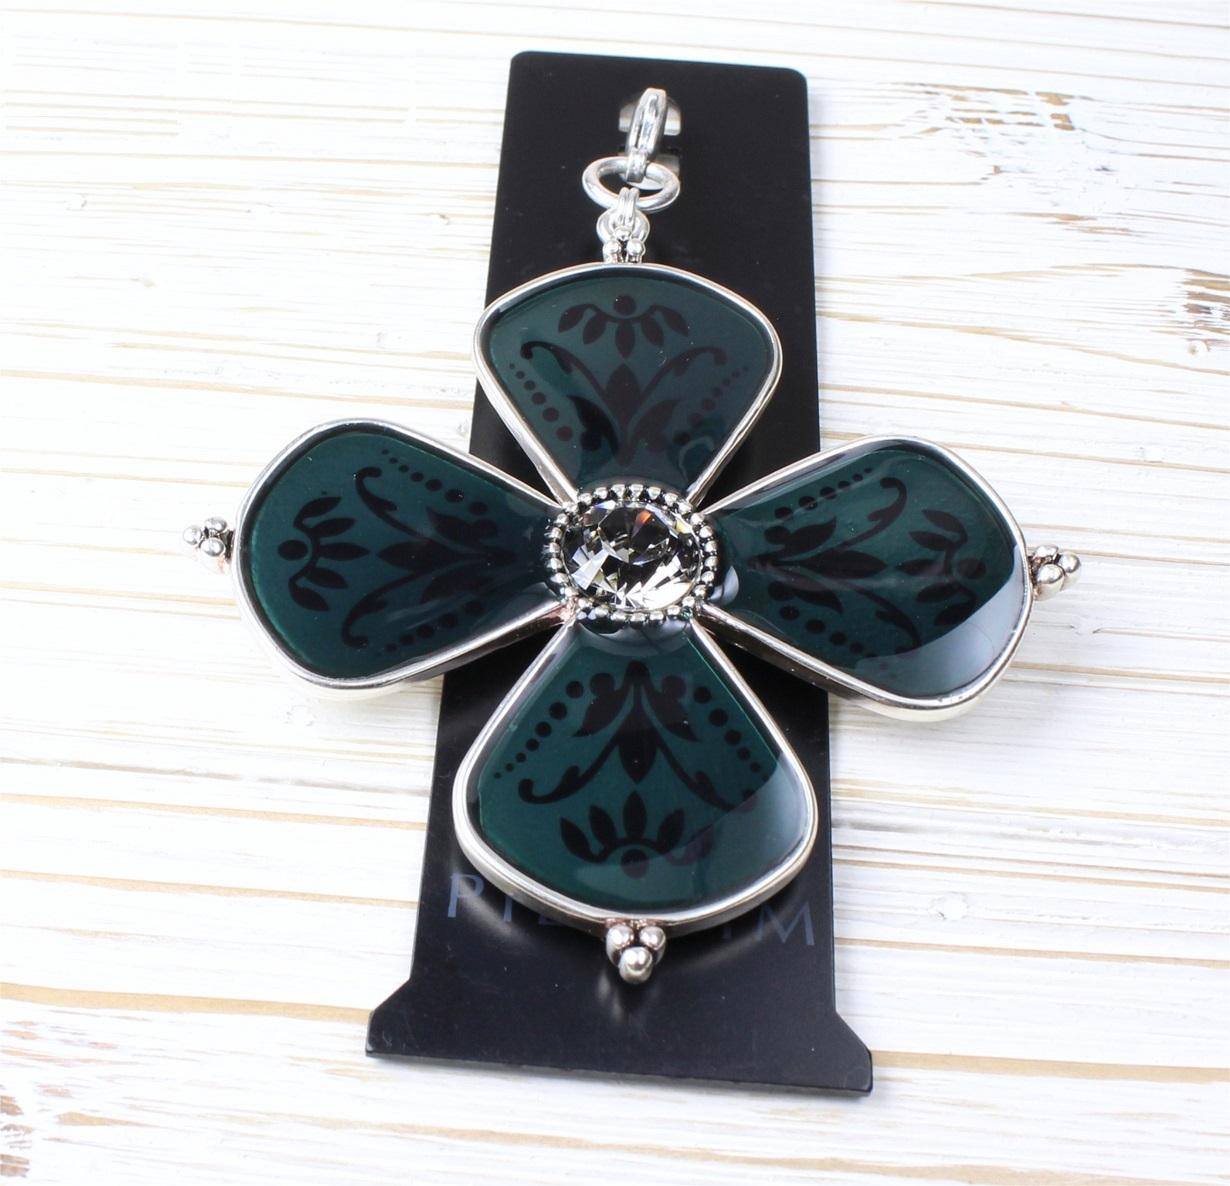 PILGRIM - Devotion Flower MEGA Charm - Silver Plate/Teal Enamel BNWT